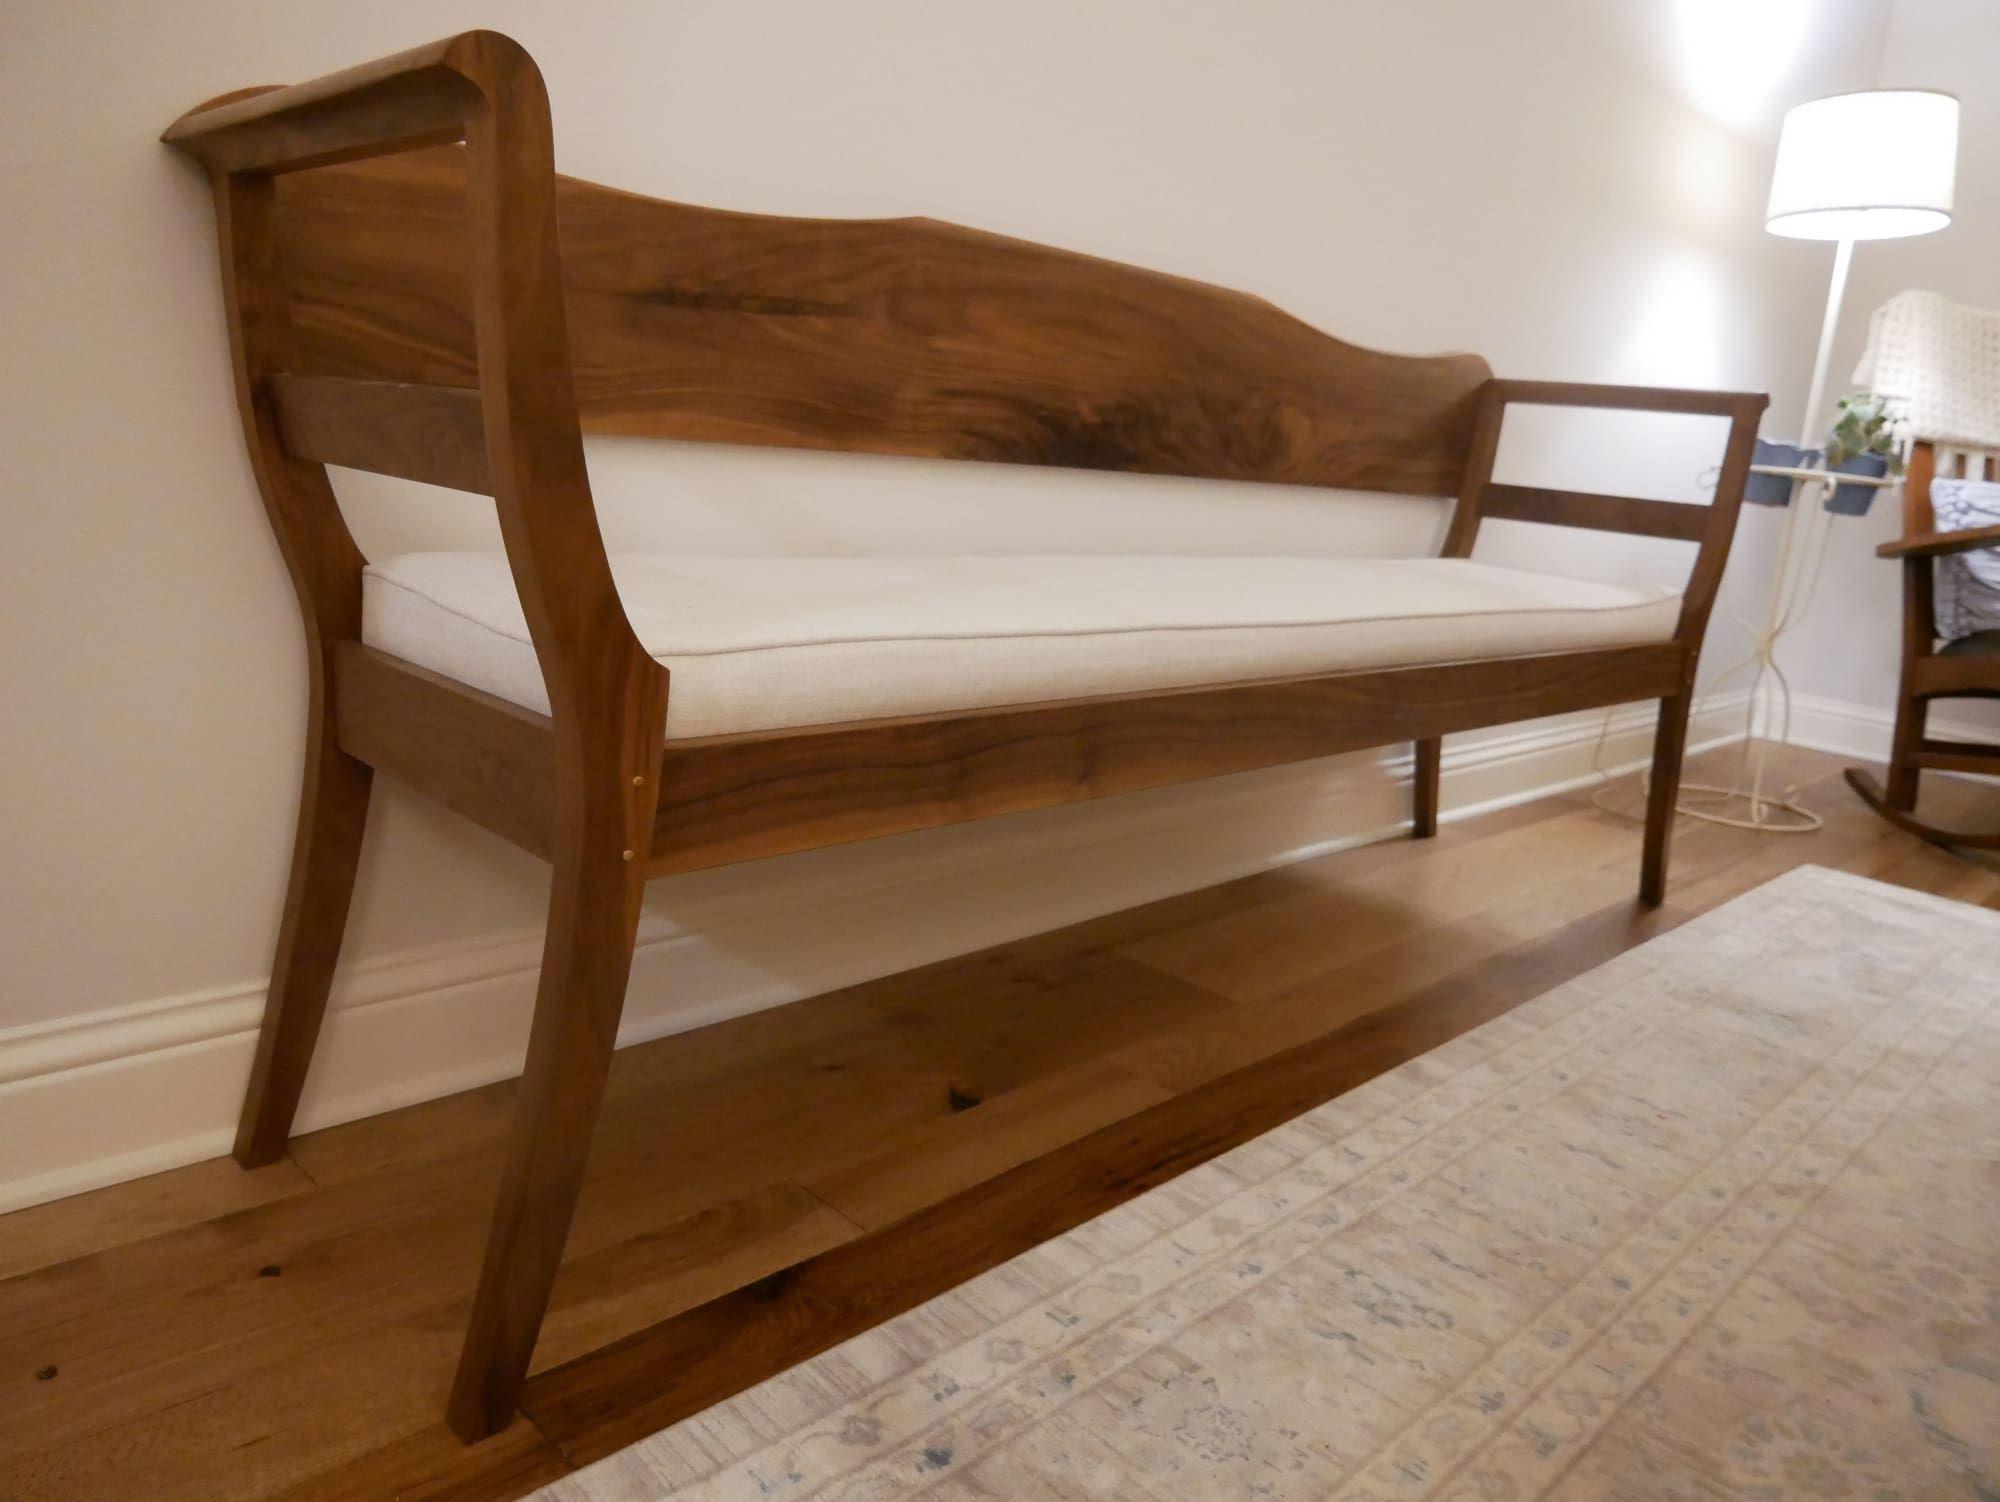 Andy Rawls Fine Texas Woodcraft Brenham Settee As Seen In Boerne